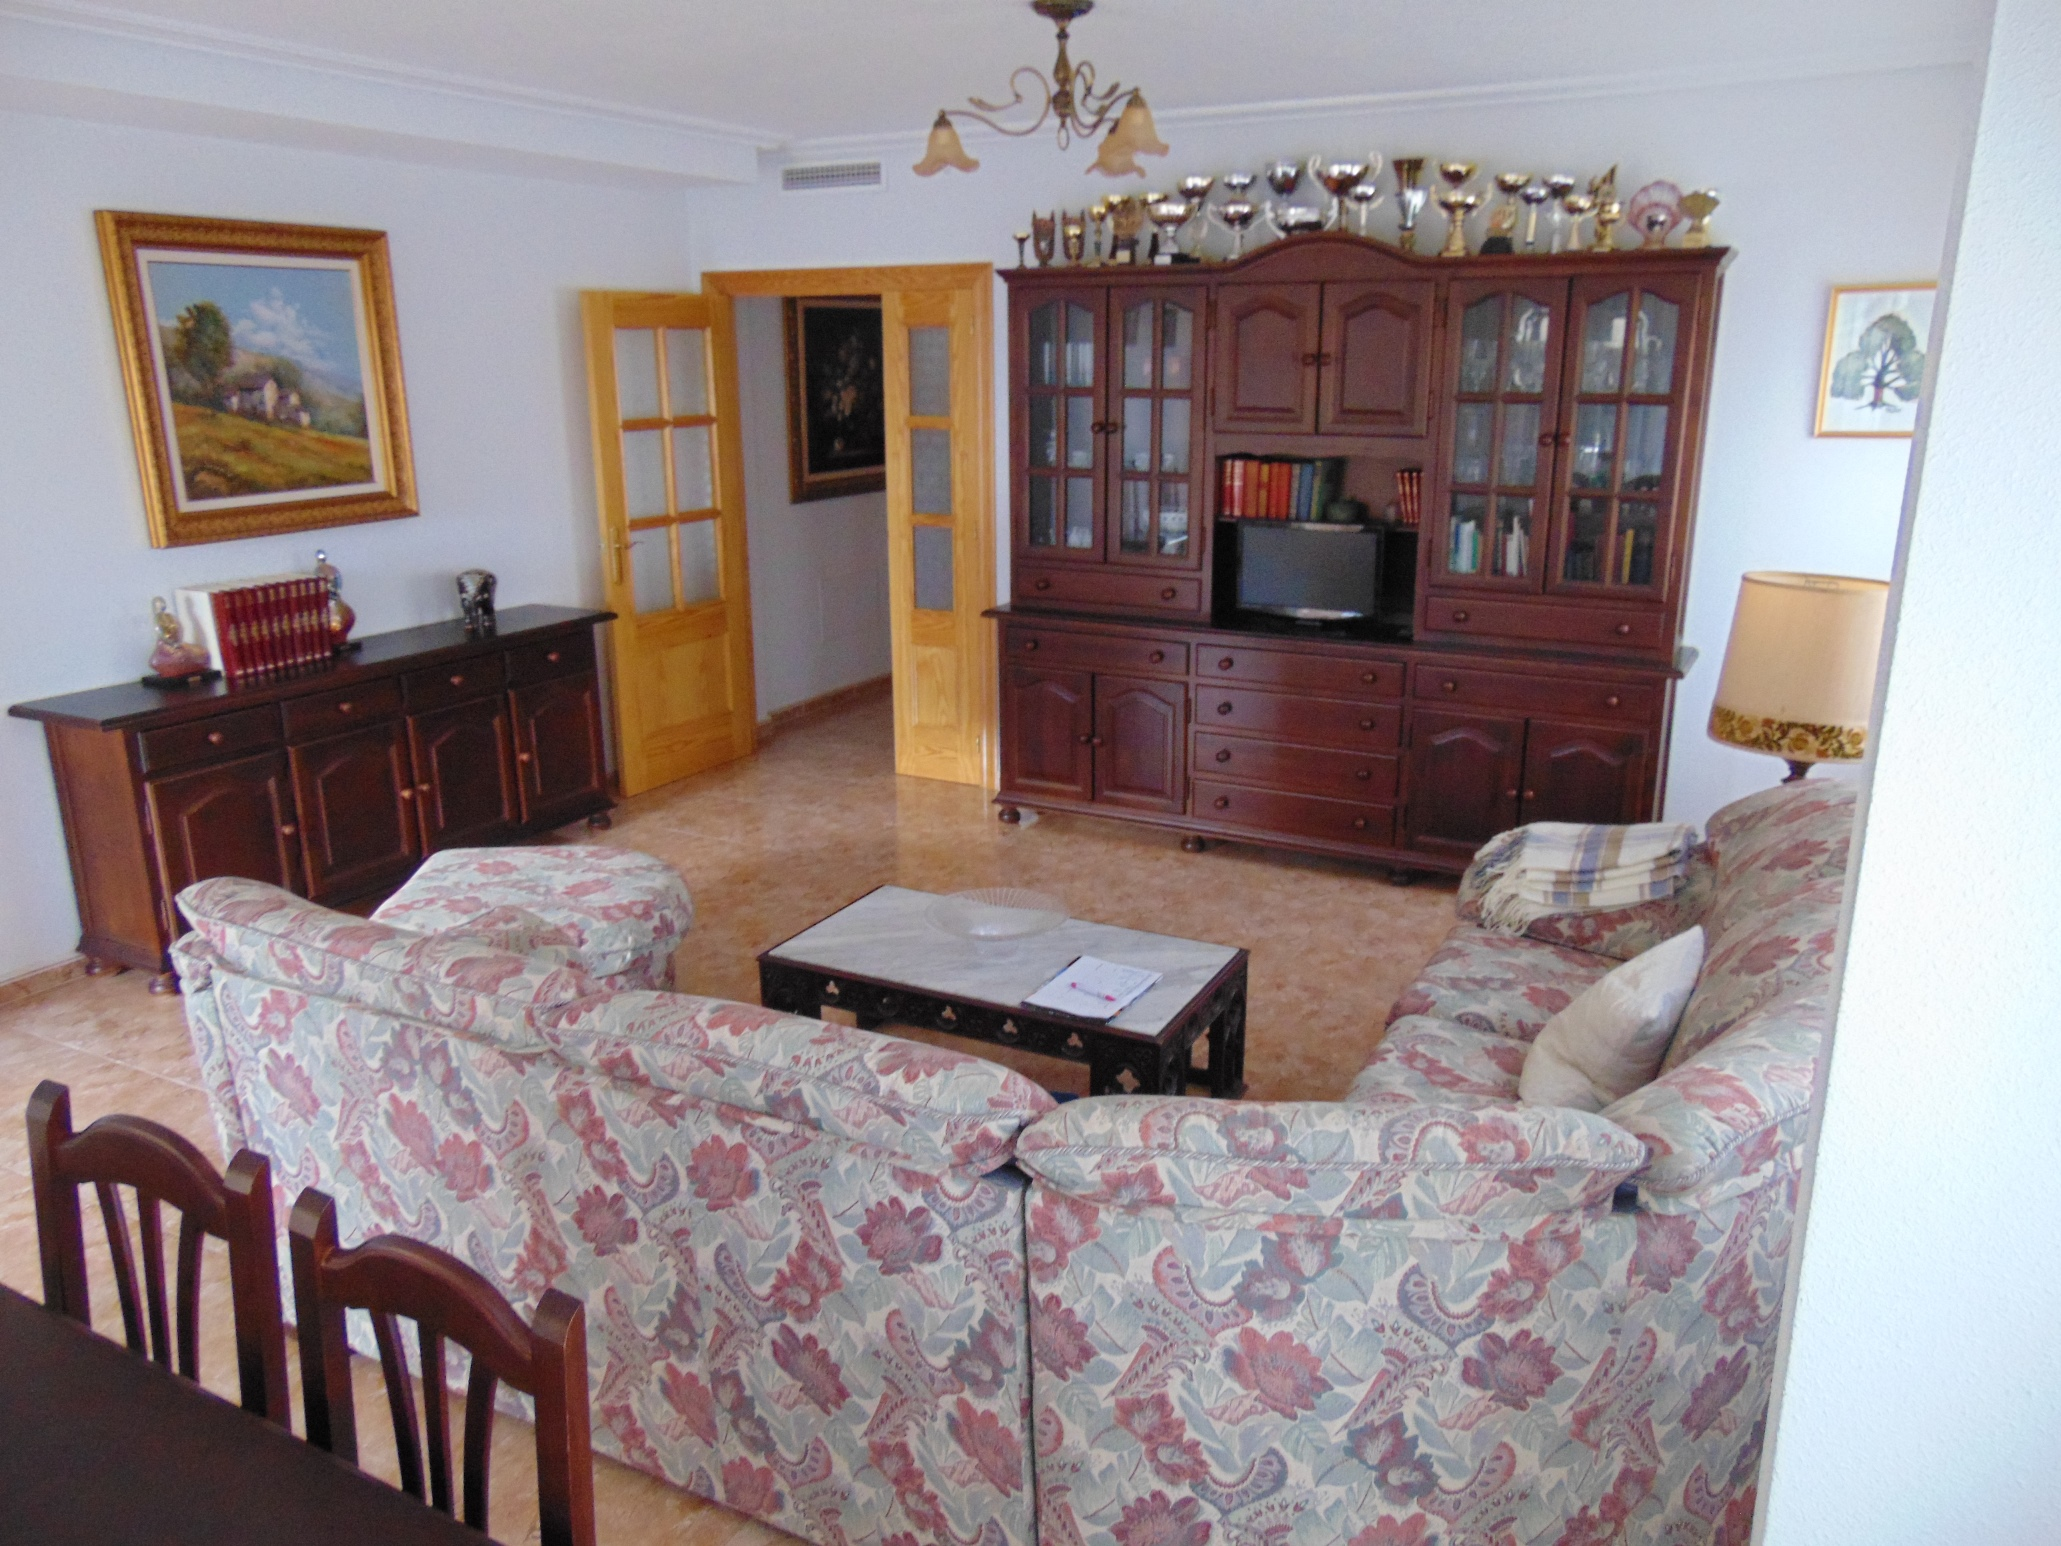 Propery For Sale in San Pedro del Pinatar, Spain image 7